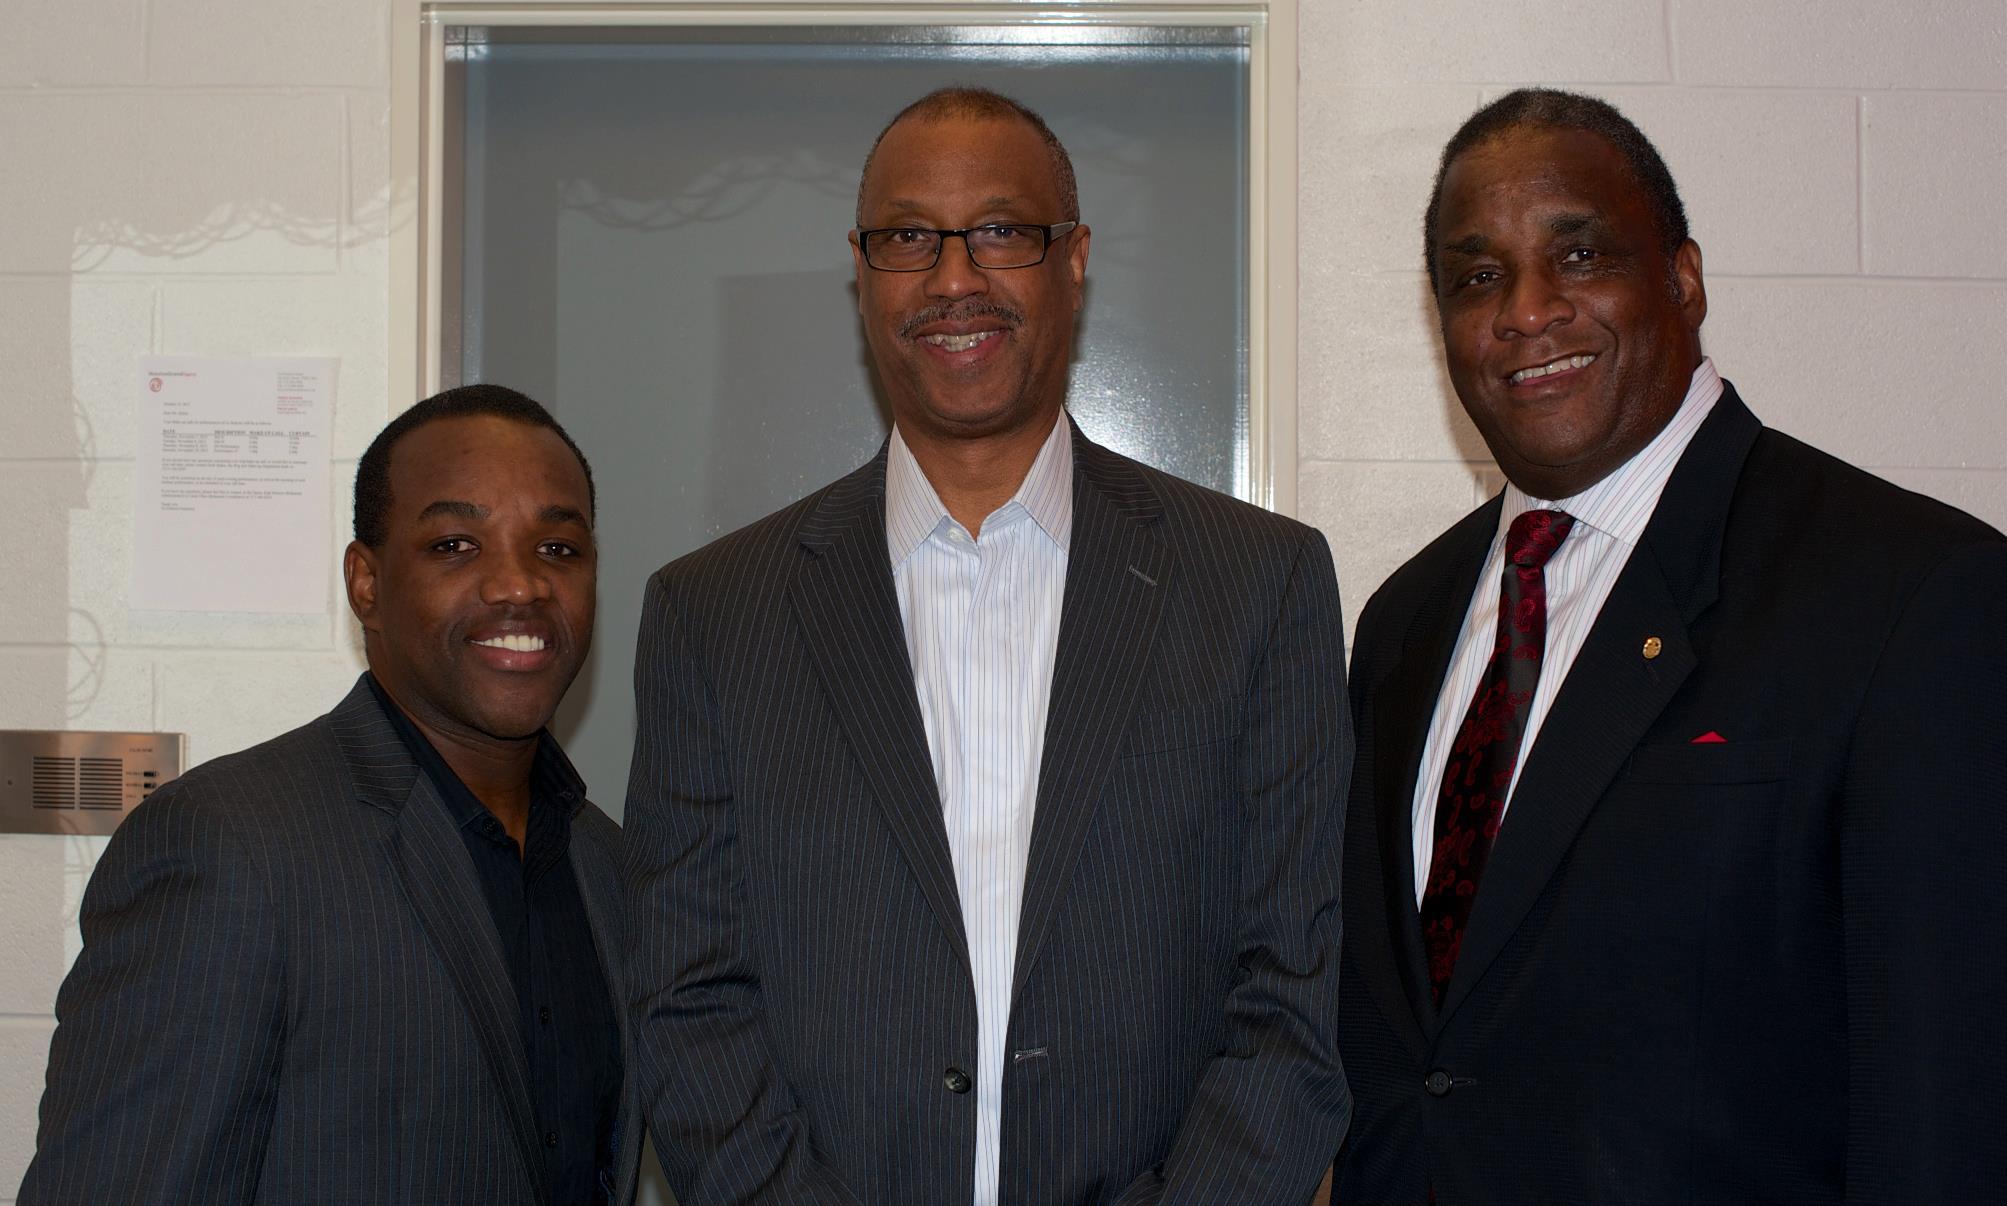 Randy Bates, Grand Polemarch of Kappa Alpha Psi, and Elder Watson Diggs Laureate